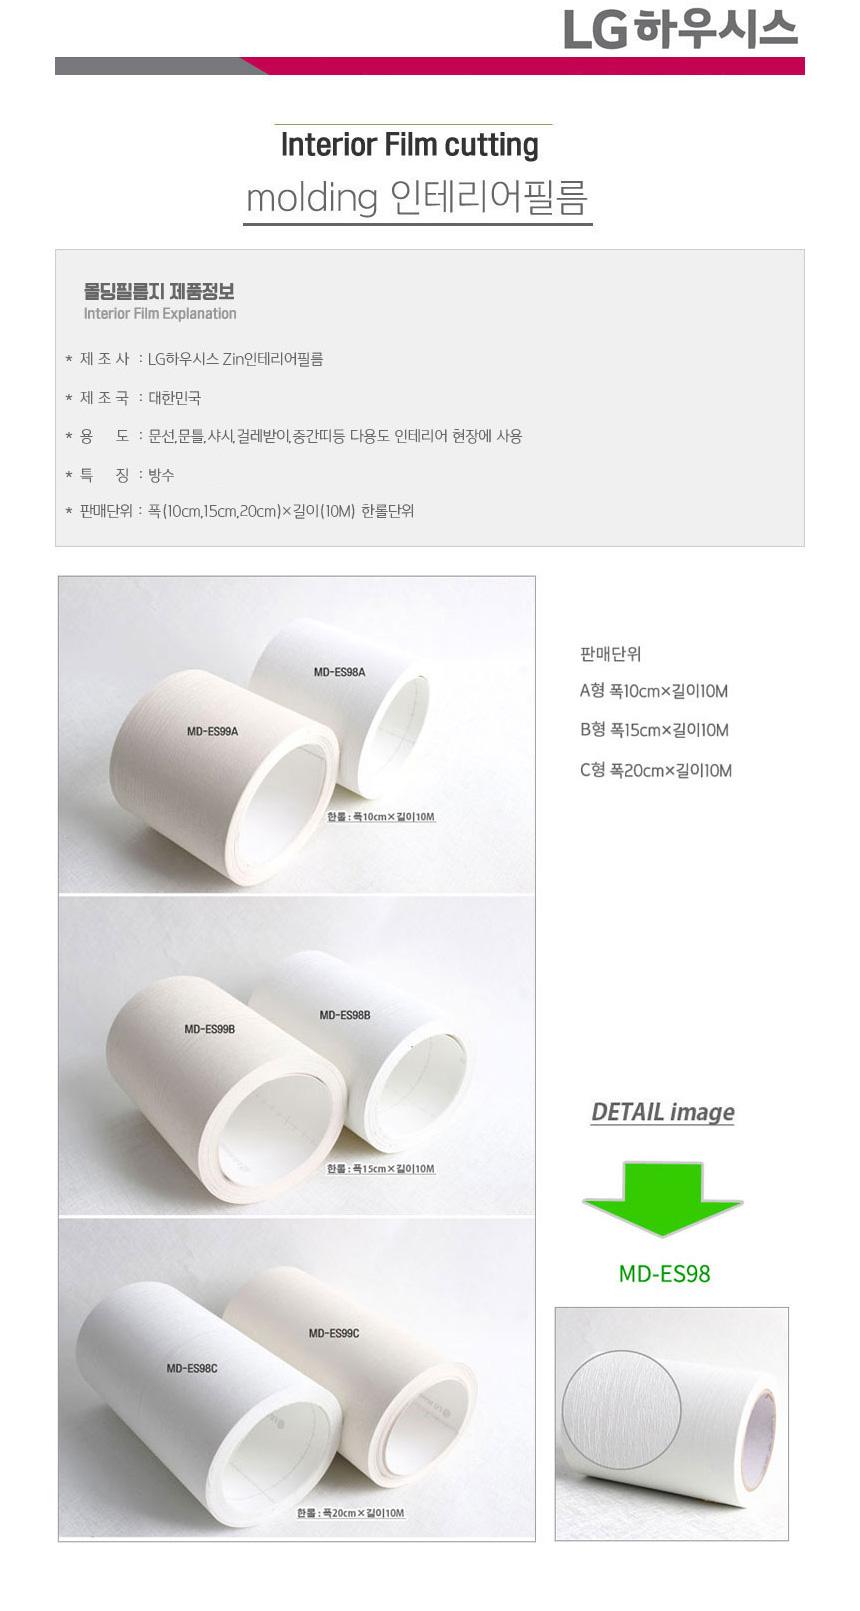 LG몰딩필름 몰딩시트지 (MD-ES98) - 데코사랑, 10,260원, 벽지/시트지, 디자인 시트지